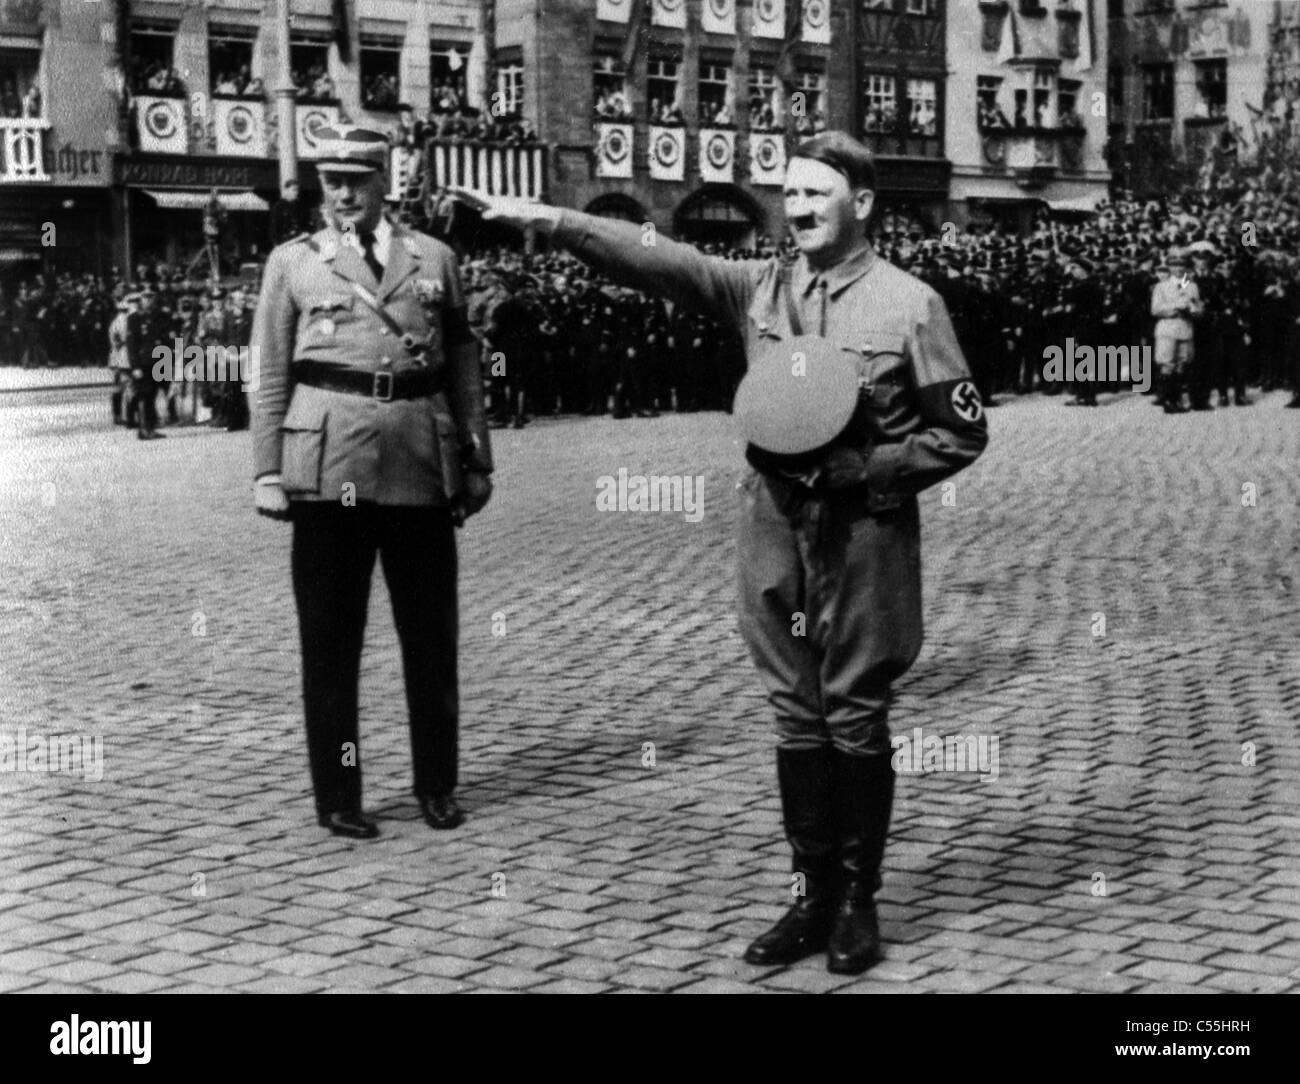 ADOLF HITLER FUHRER OF GERMANY NAZI LEADER 07 June 1938 - Stock Image